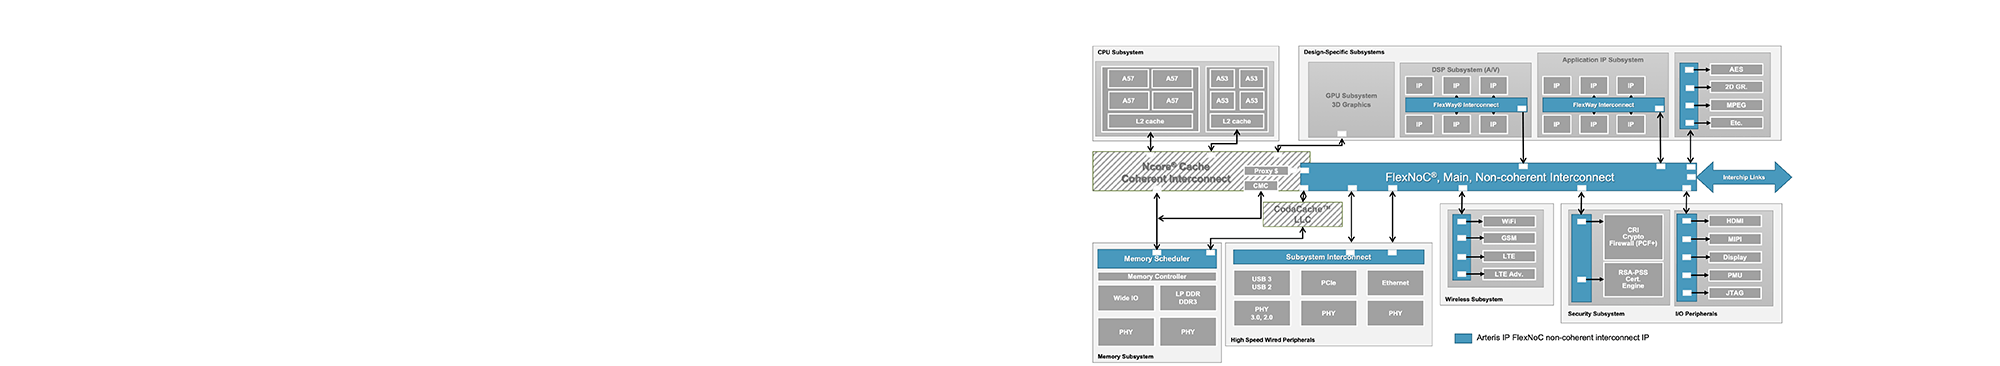 flexnoc-block-diagram-slider-2.png